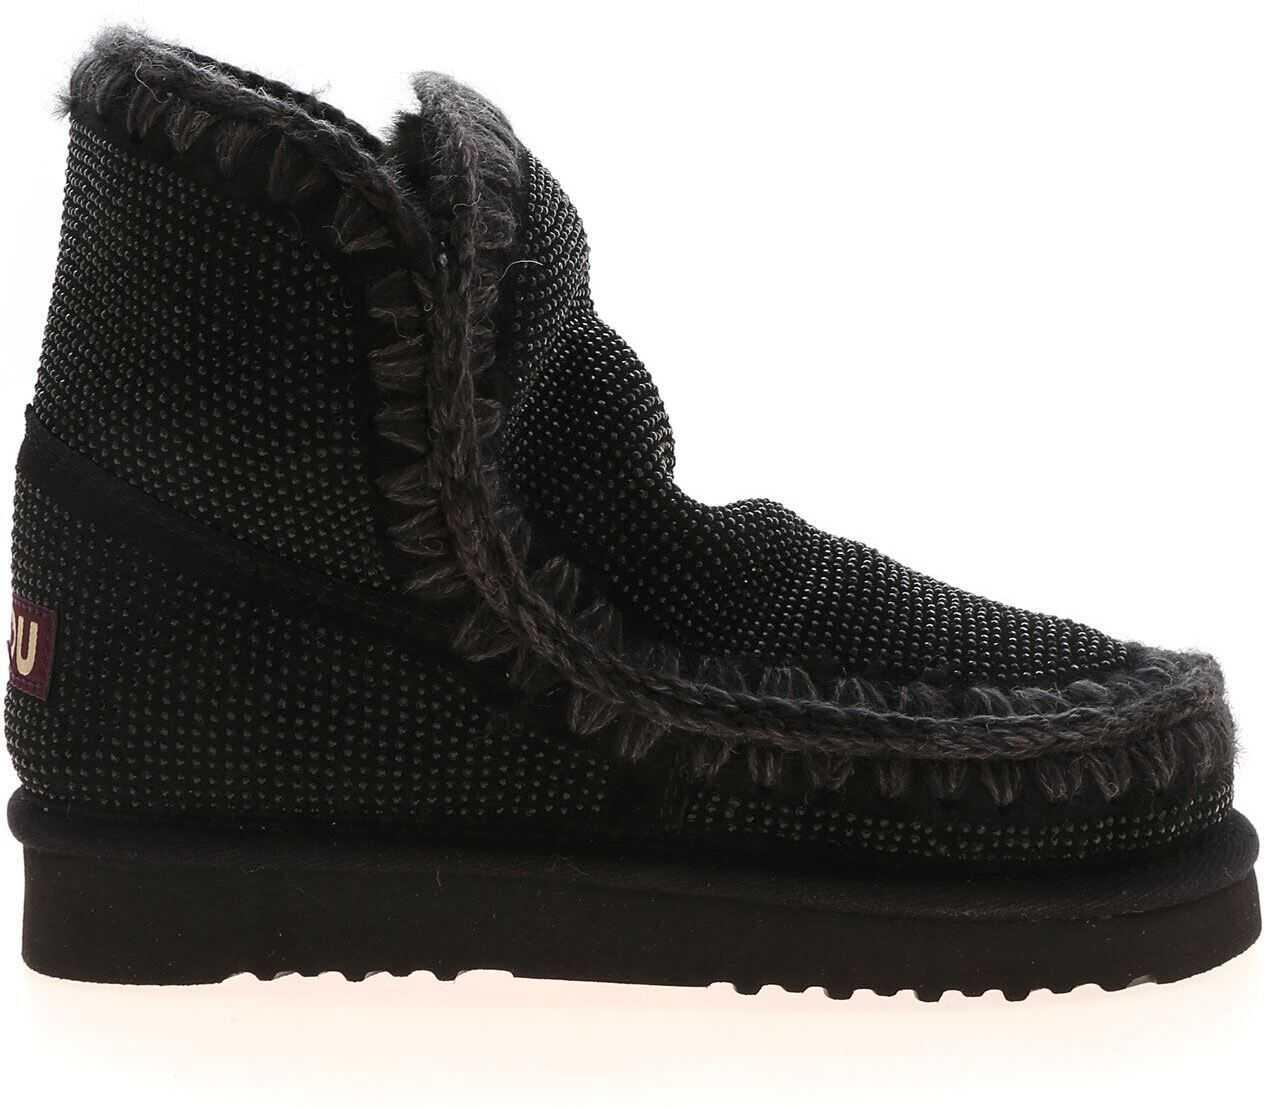 Mou Eskimo 18 Full Sneakers In Black MU.FW101039A BKBK Black imagine b-mall.ro